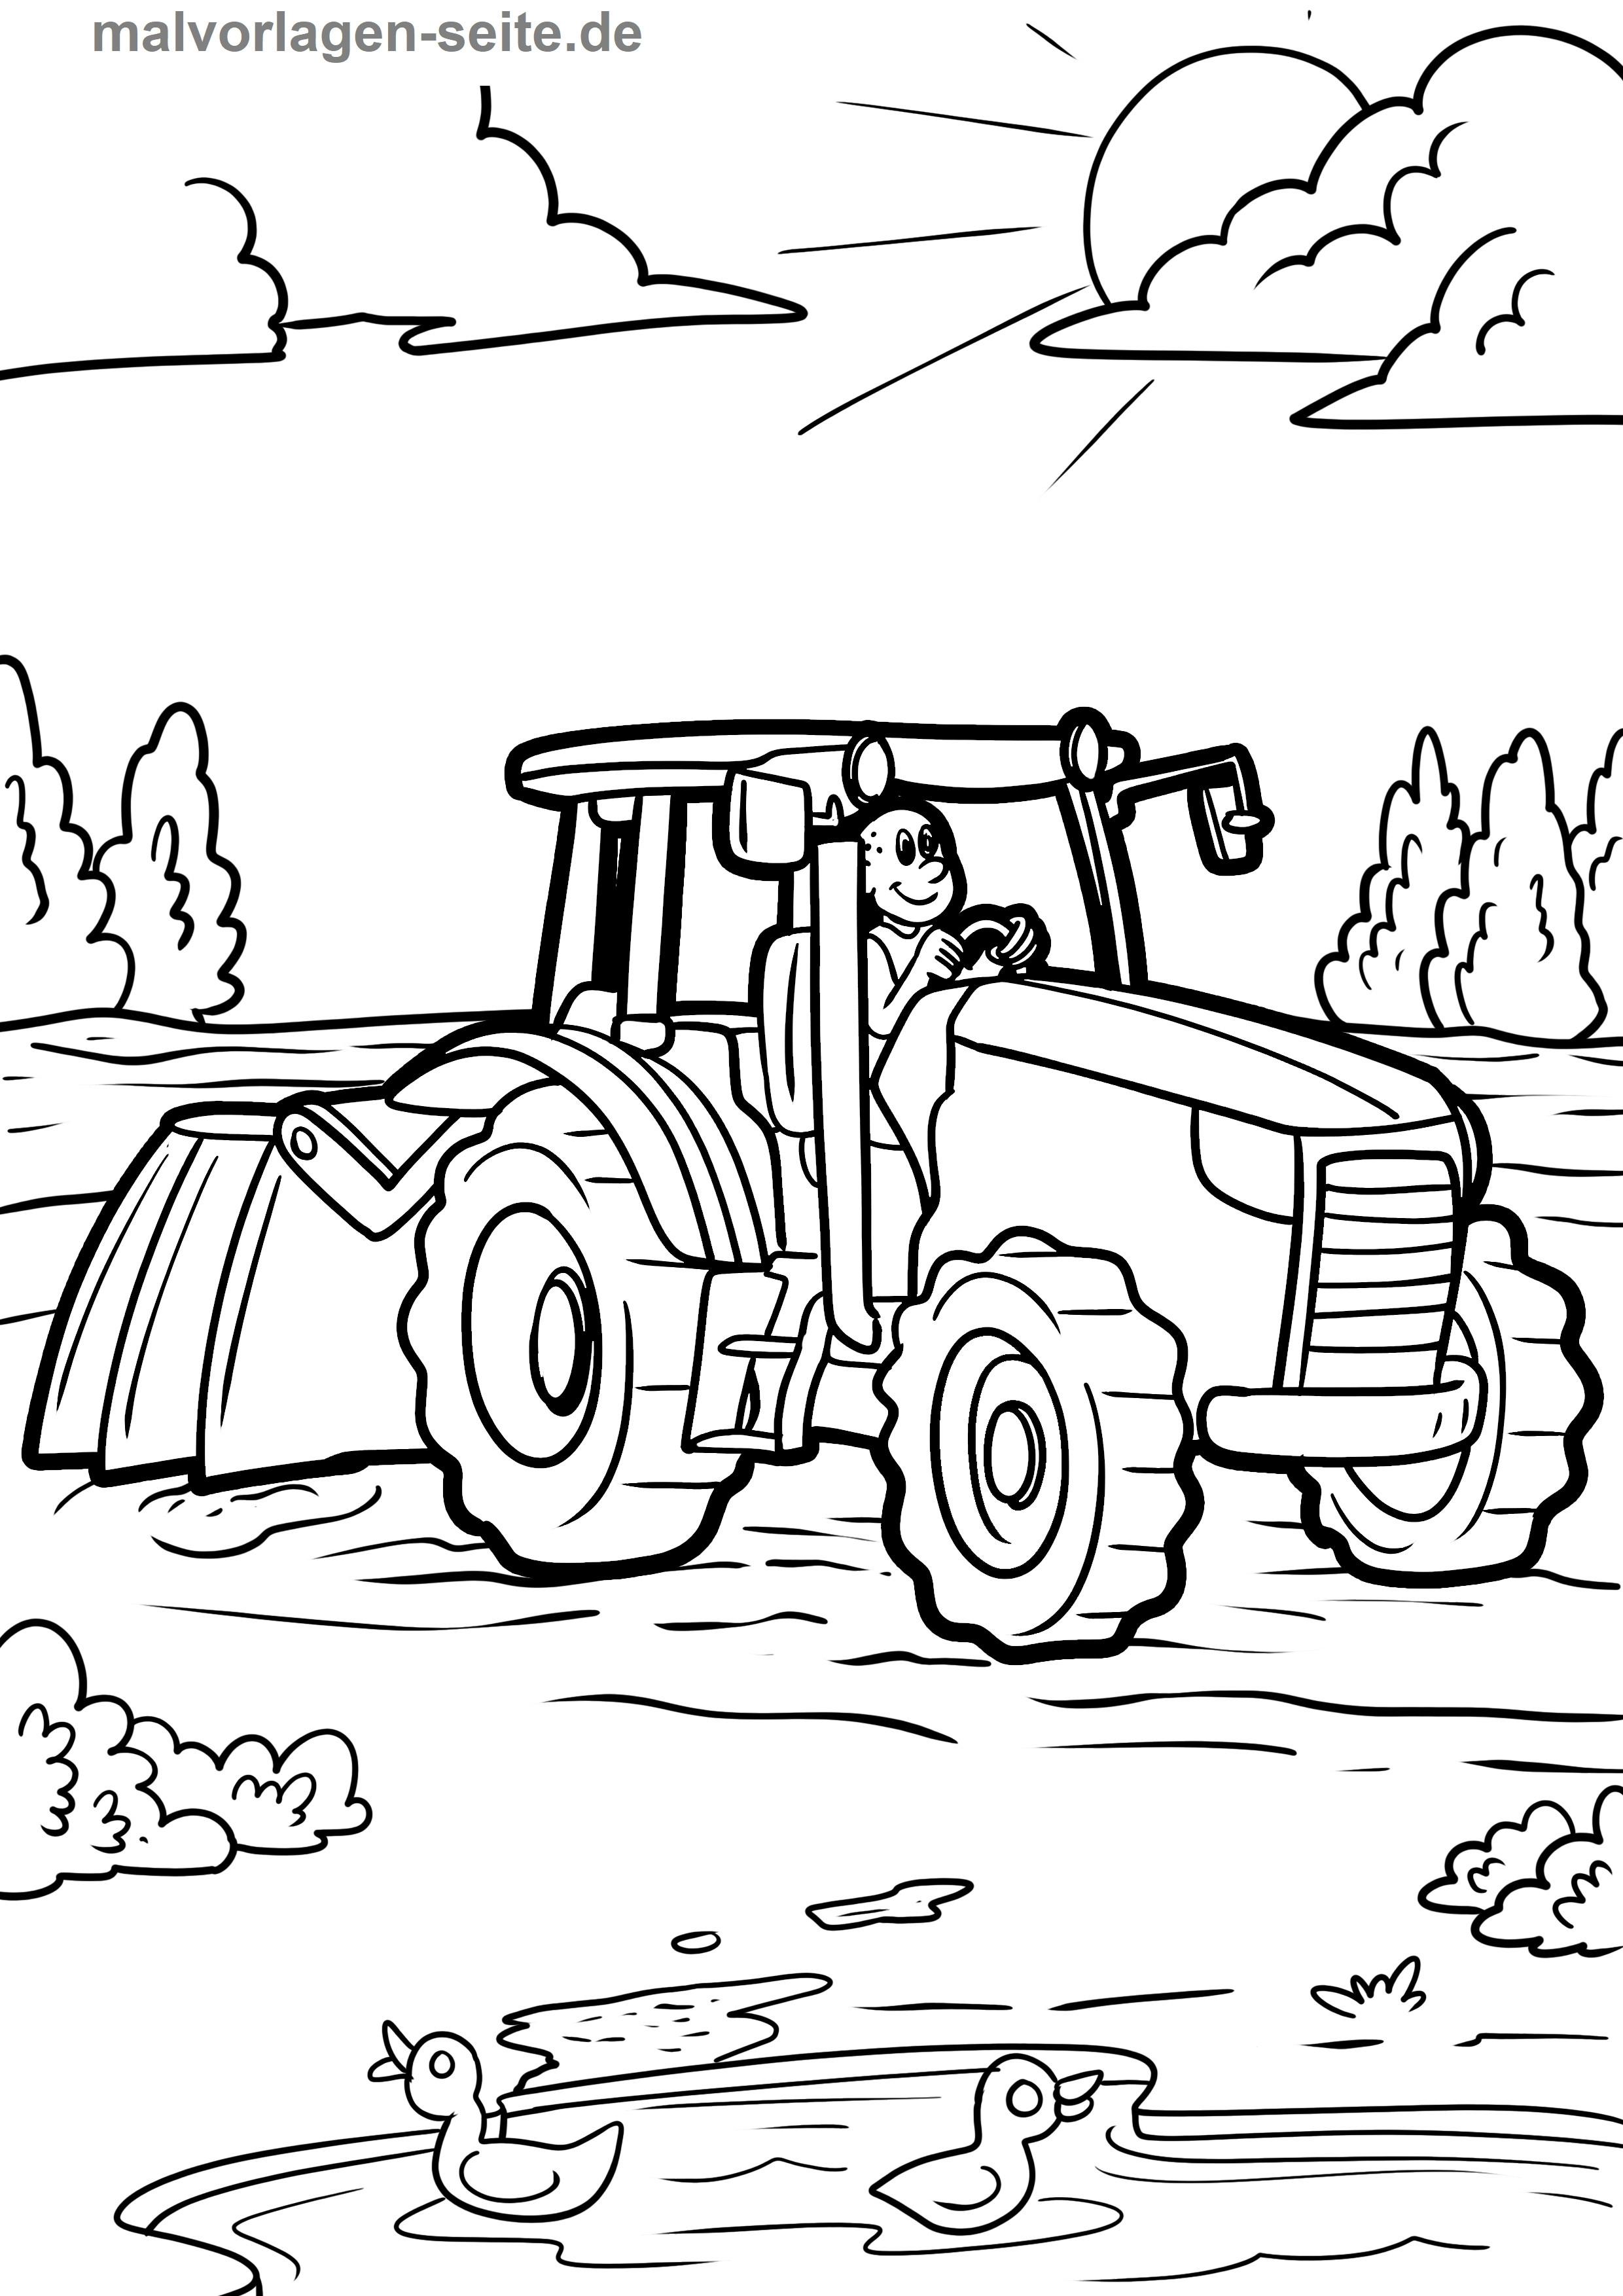 Ausmalbilder Traktor Fendt Neu Malvorlage Bauernhof Feld